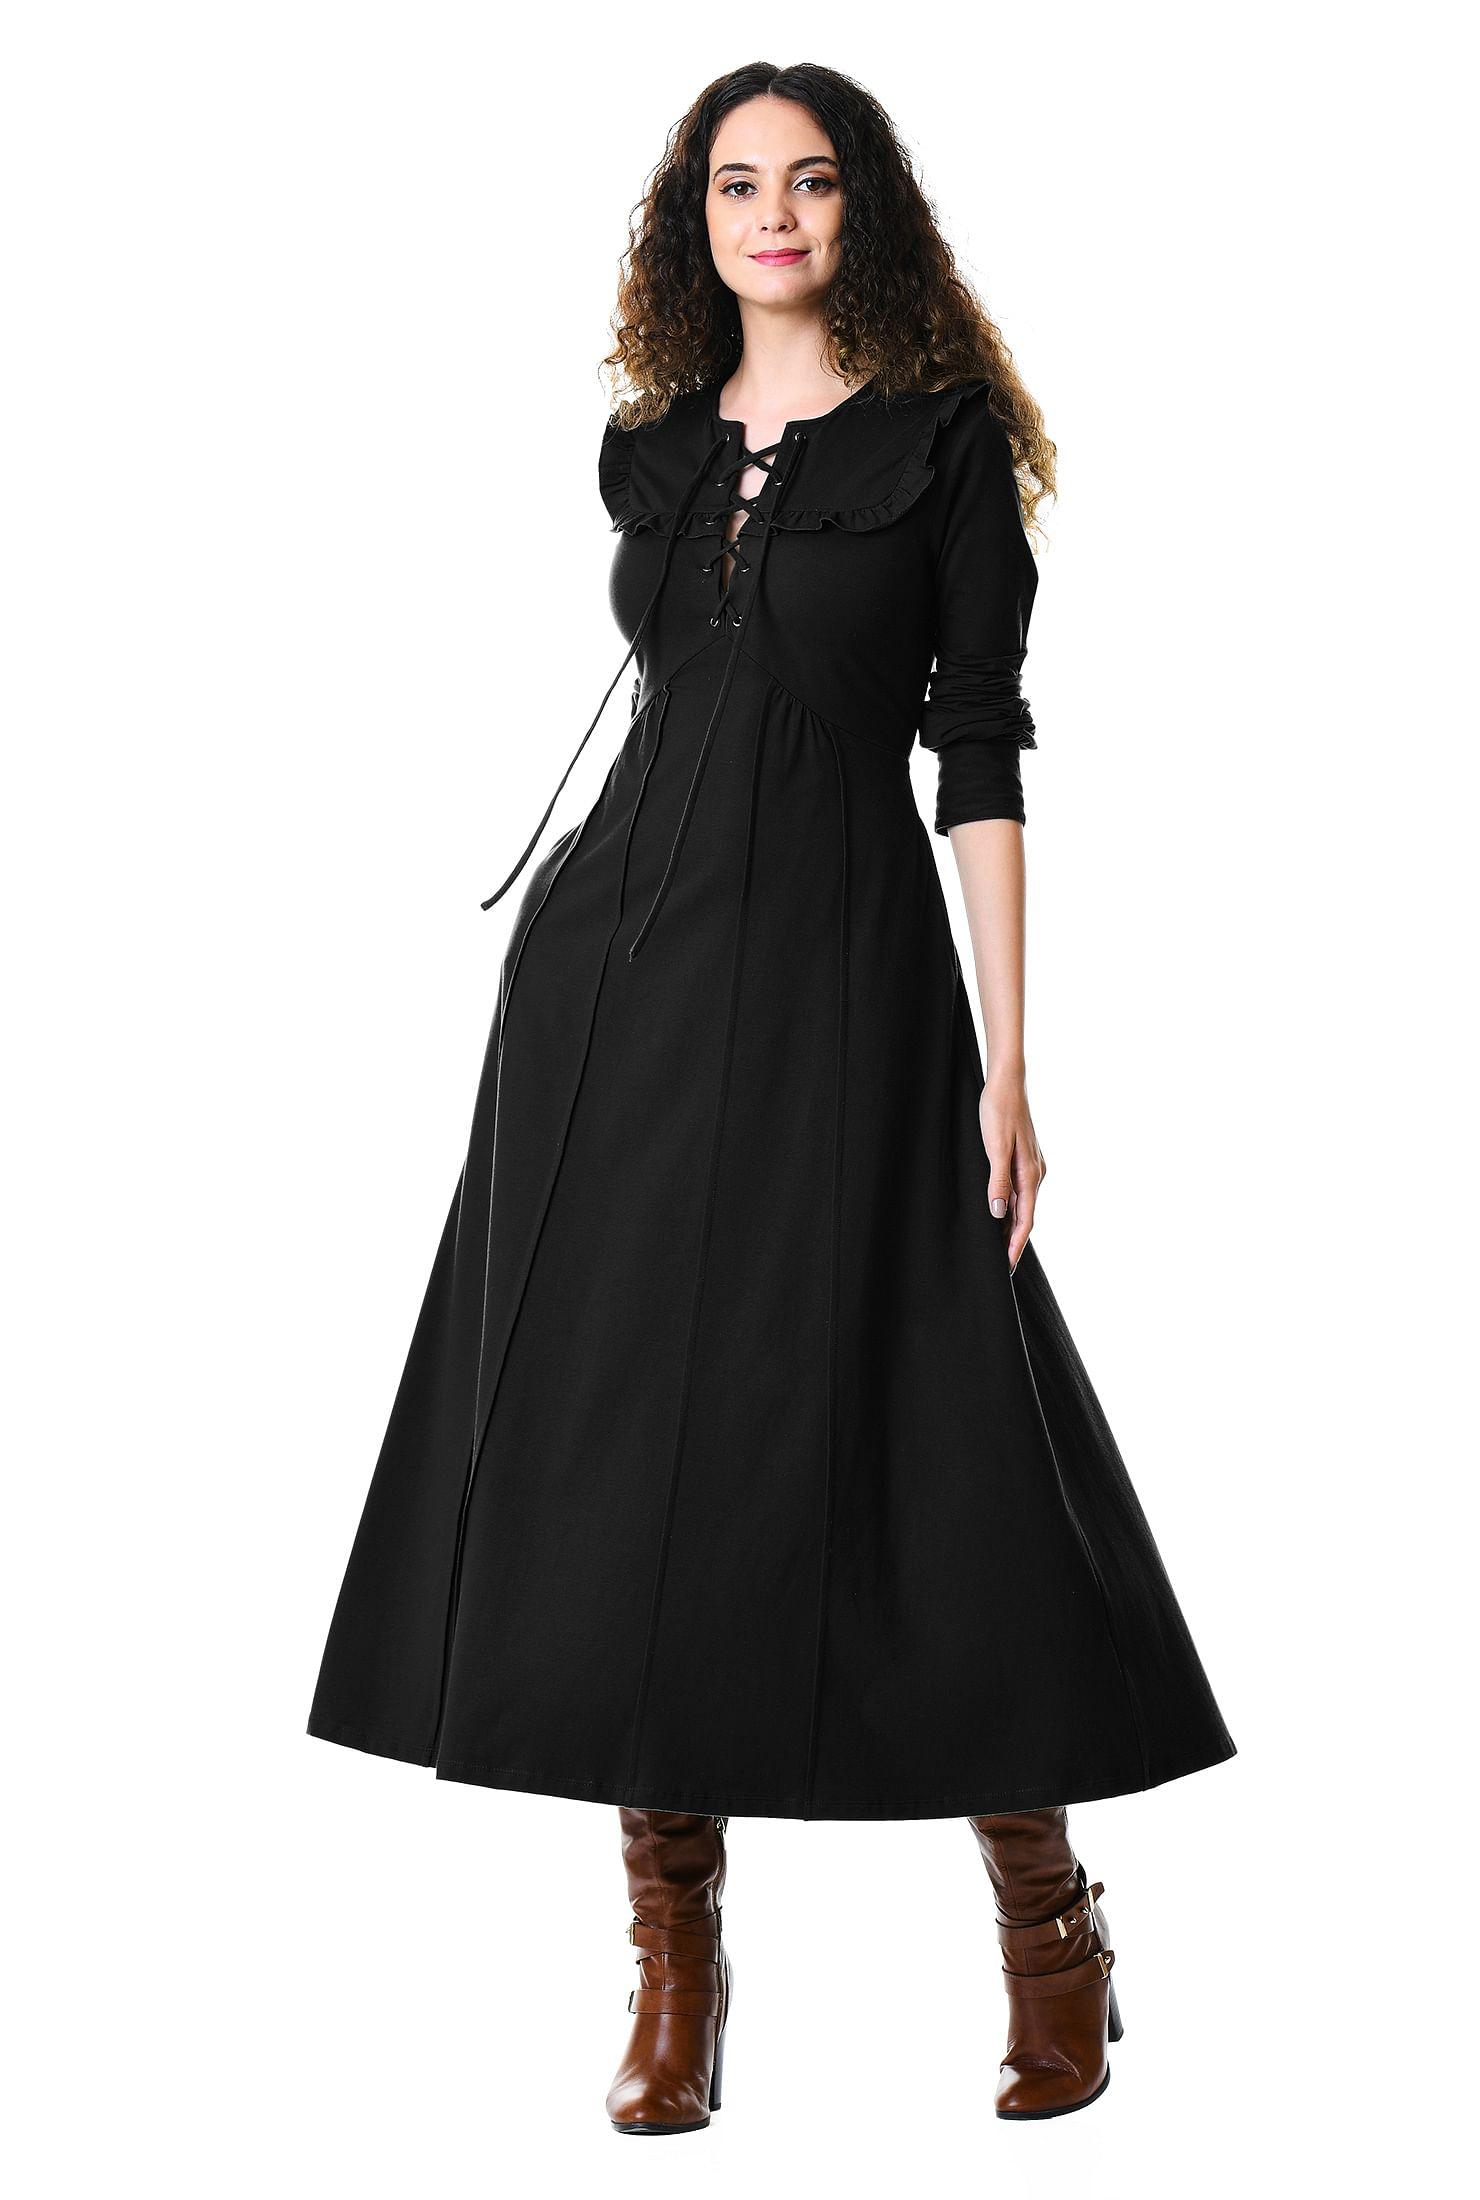 37acdbf6cd Women's Fashion Clothing 0-36W and Custom